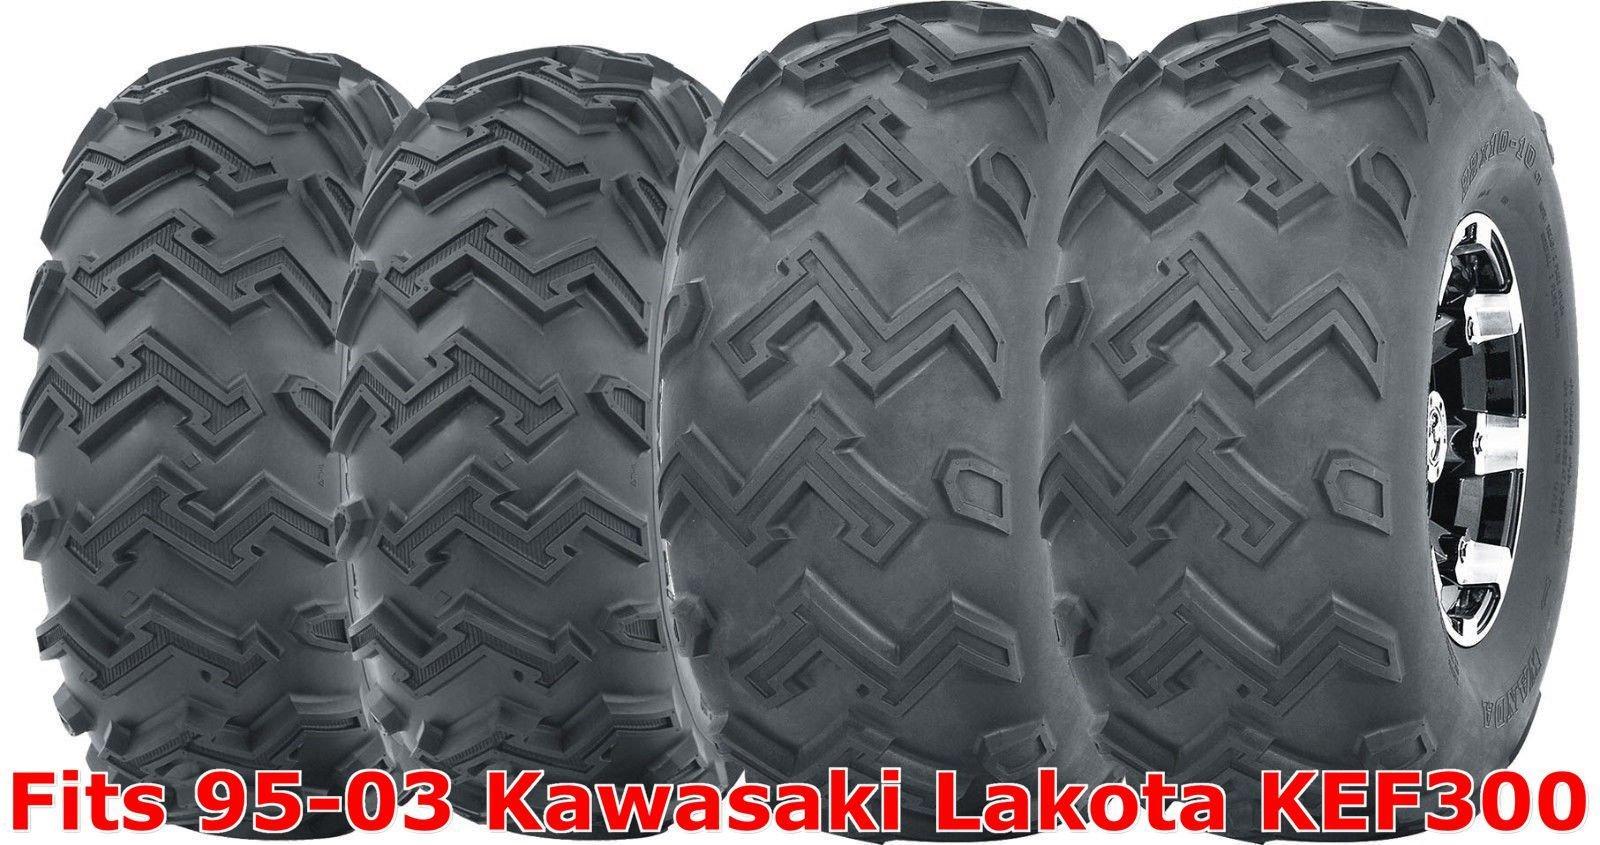 Full Set ATV tires 22x8-10 Front & 22x11-10 Rear 95-03 Kawasaki Lakota KEF300